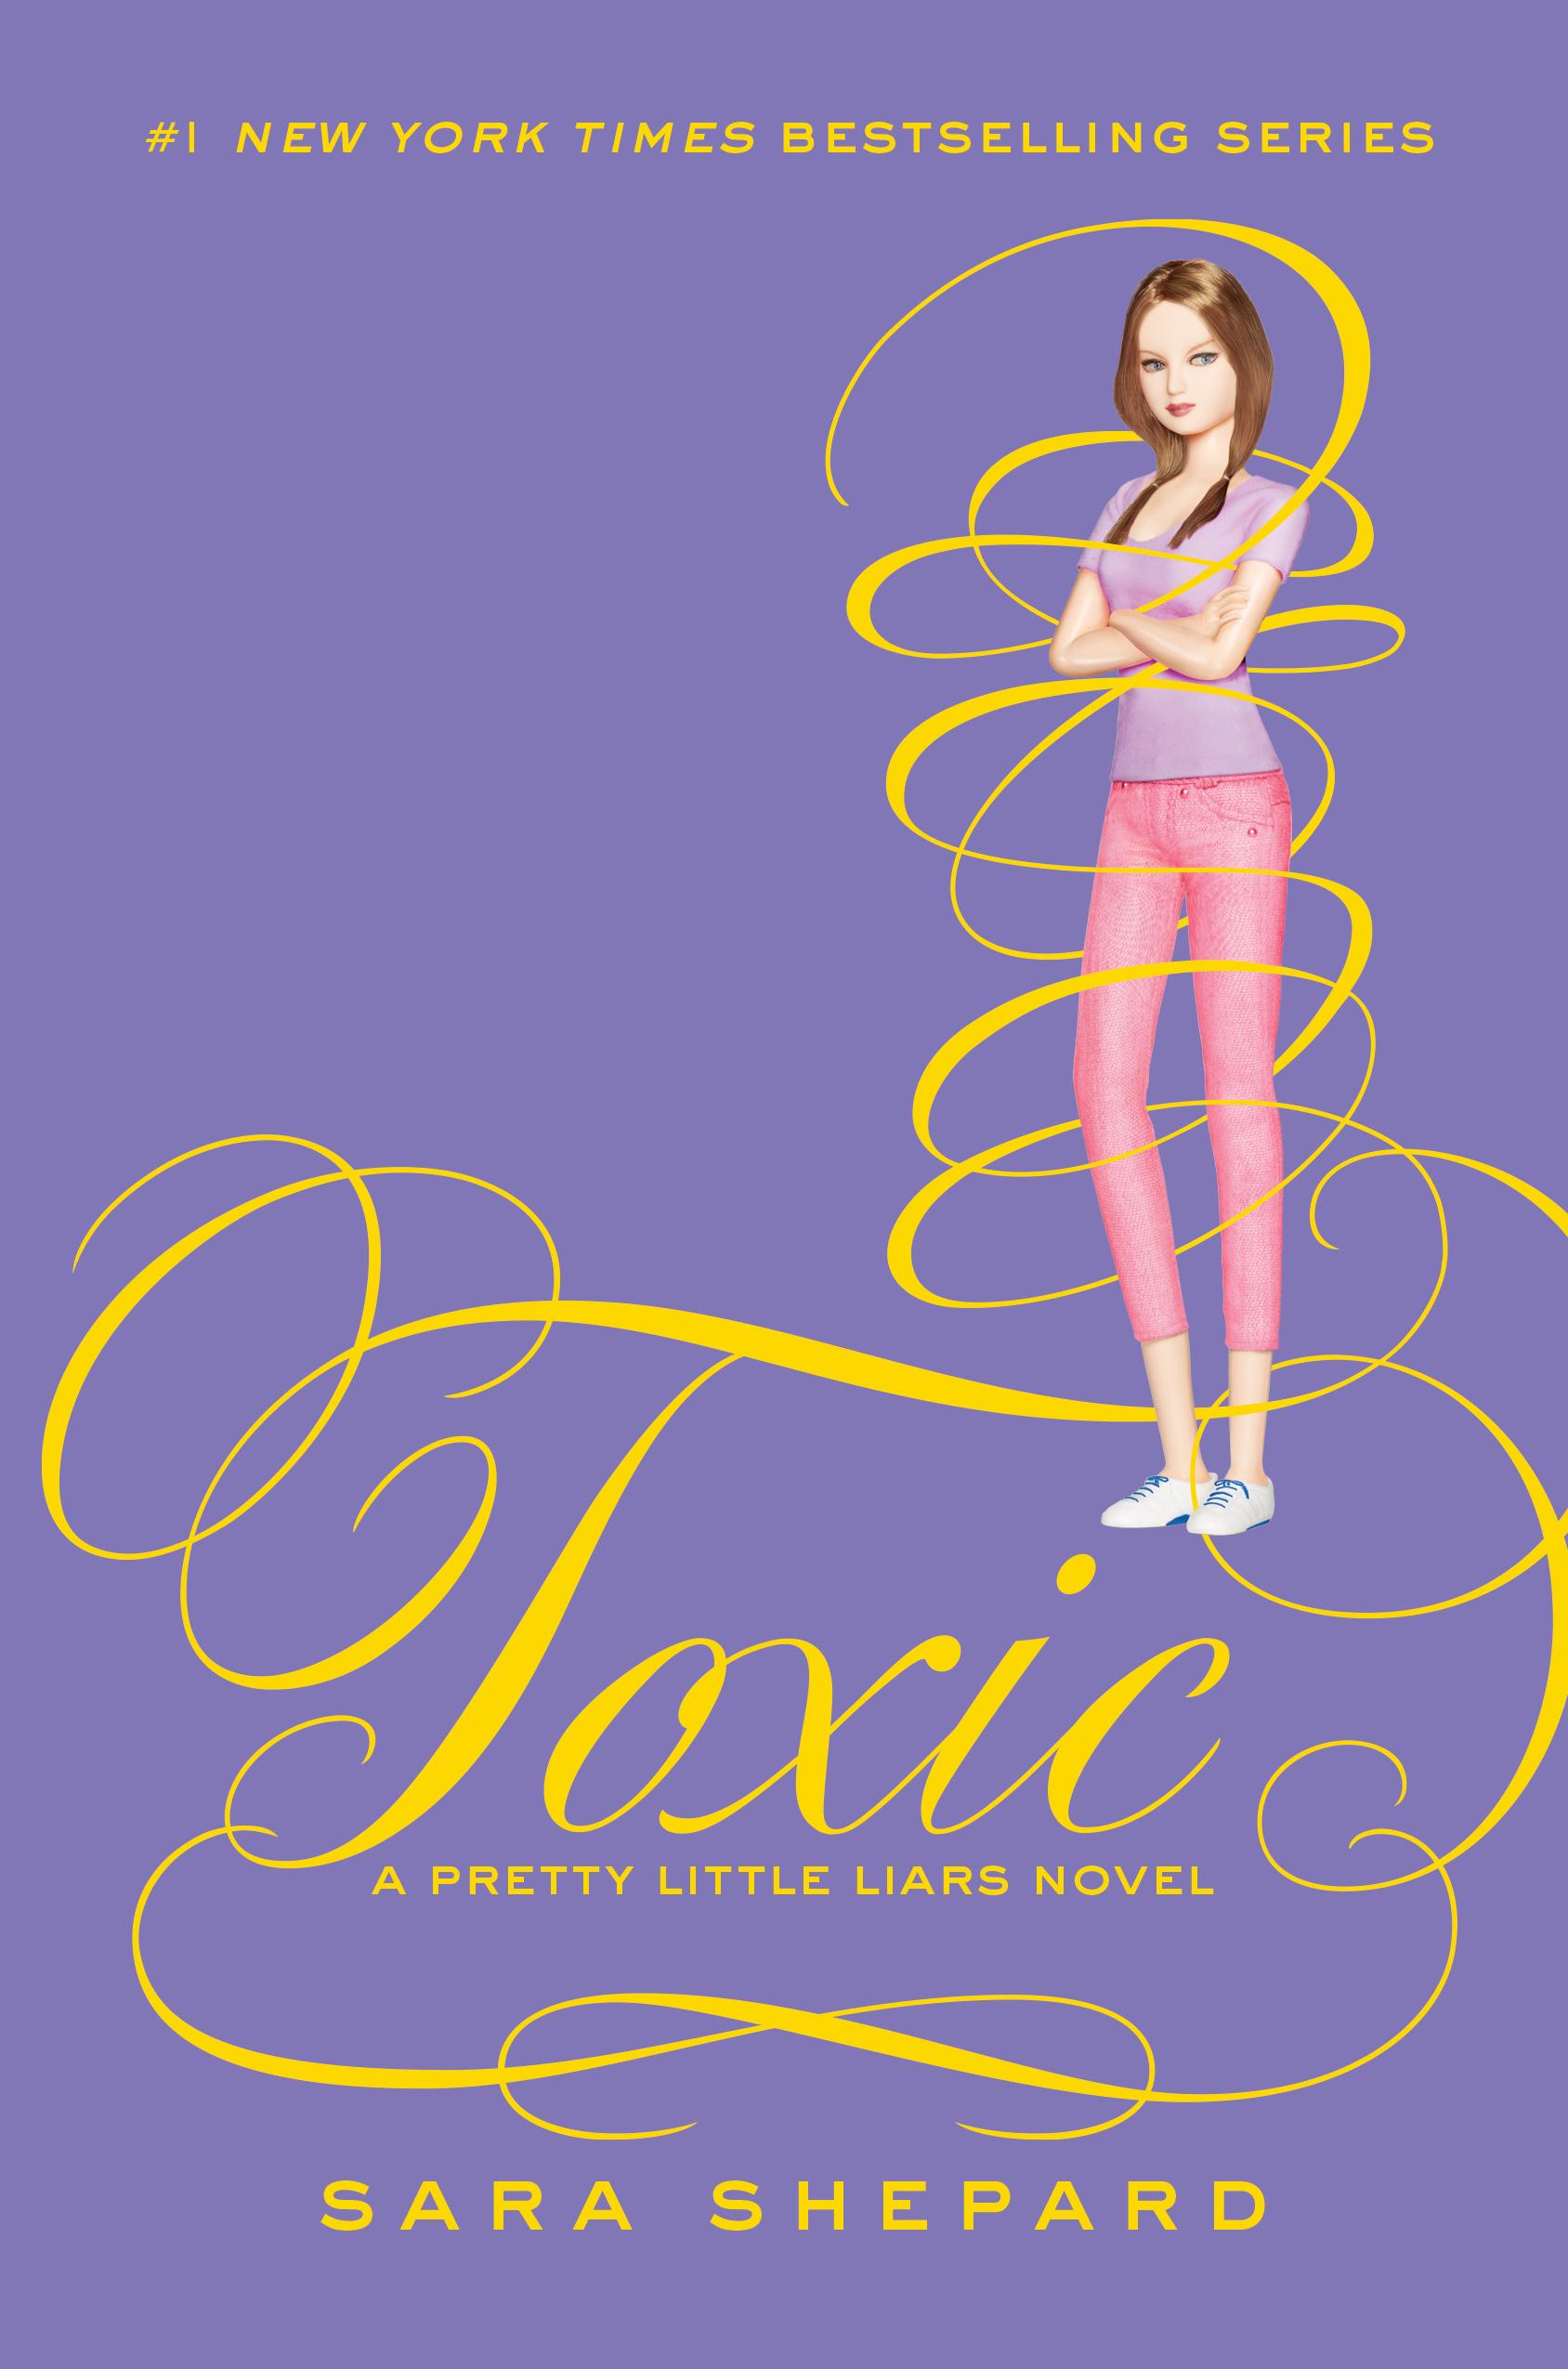 Pretty Little Liars First Book Cover : Pretty little liars book series wiki